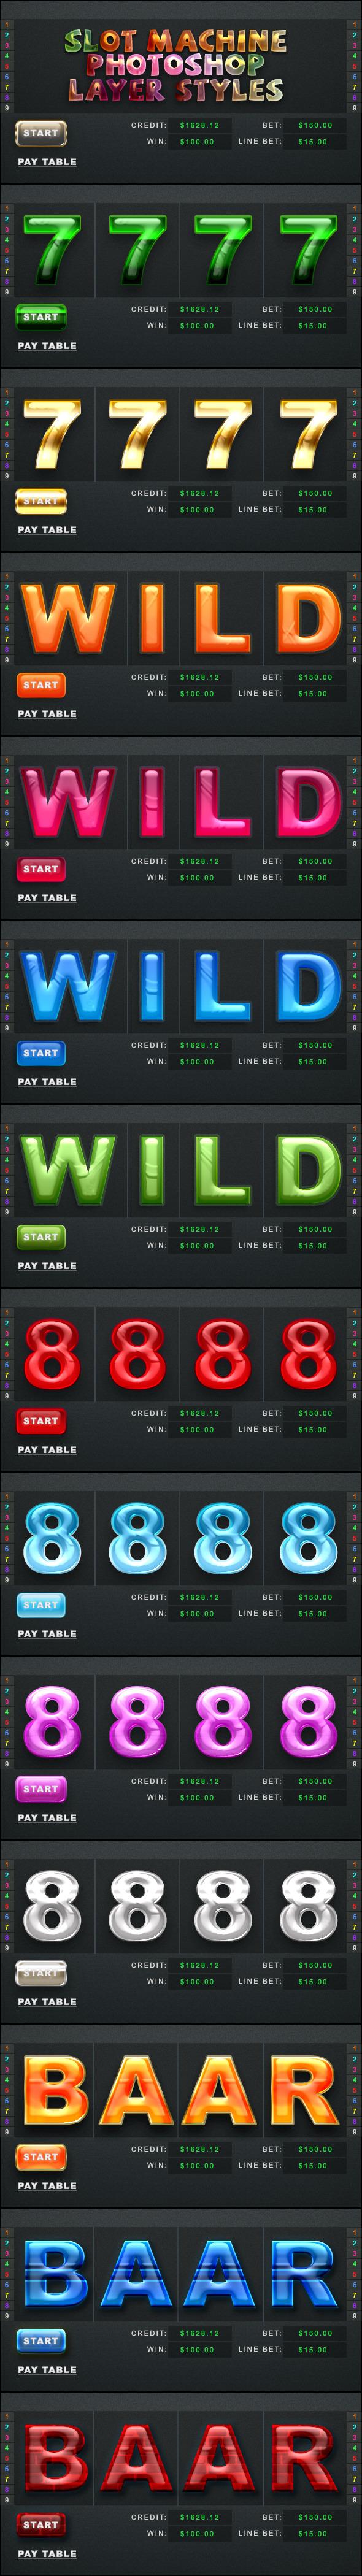 Slot Machine Photoshop Styles